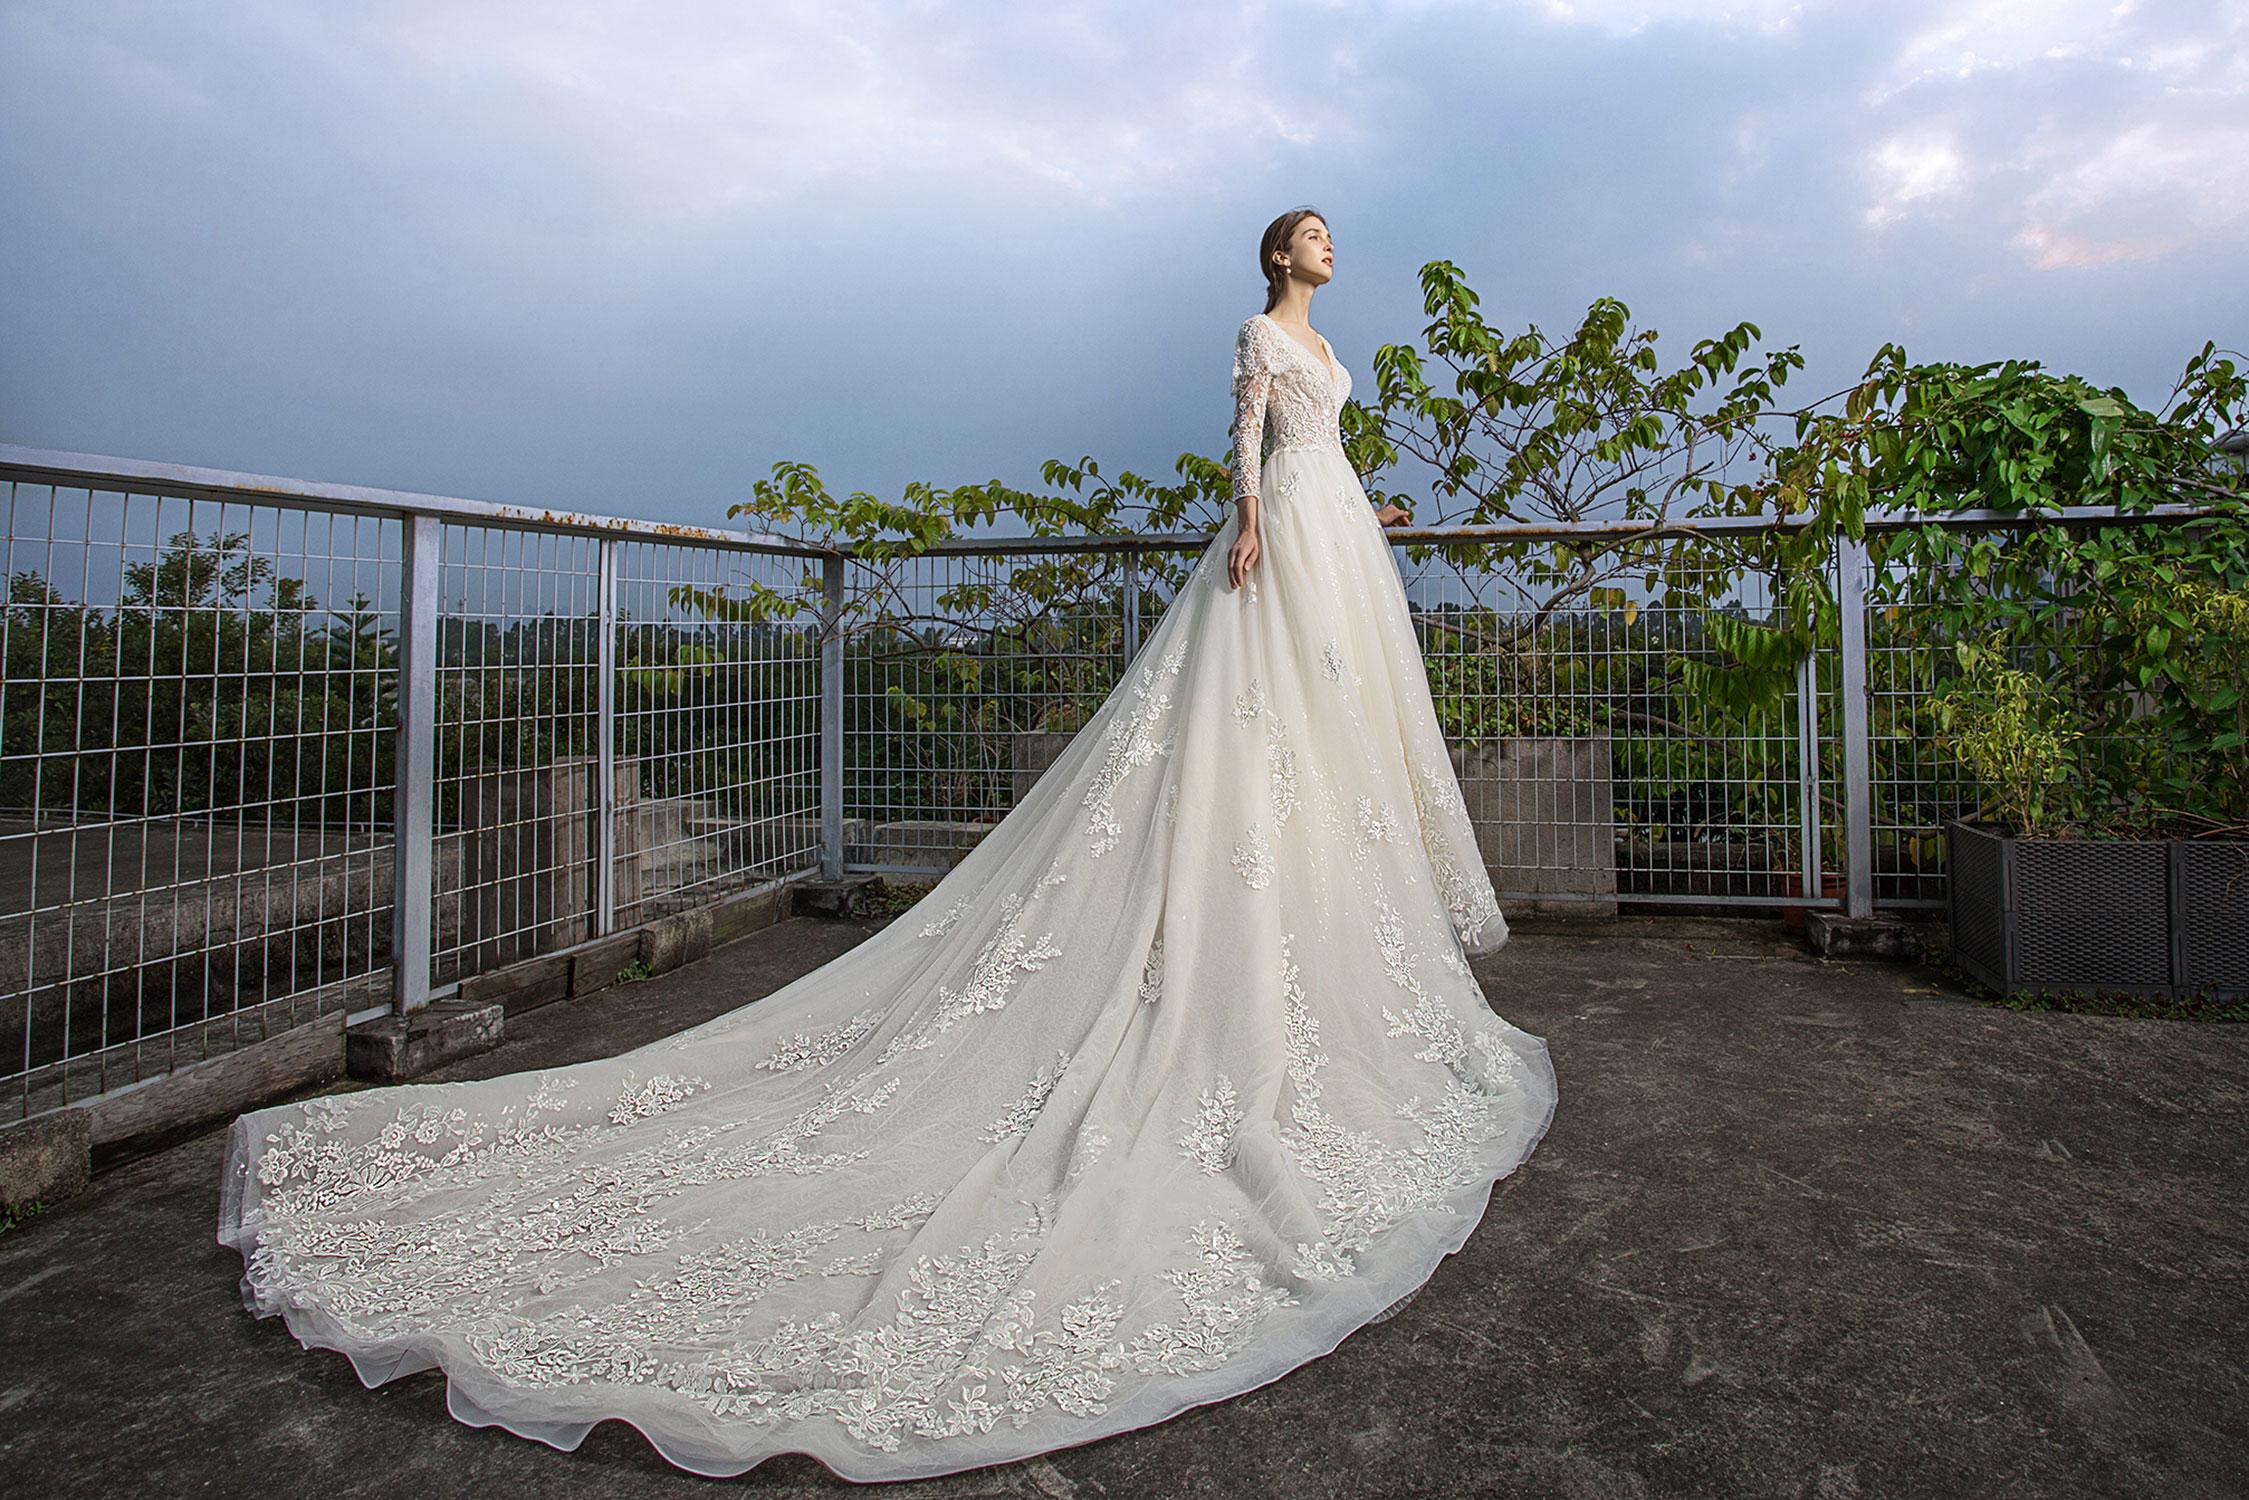 classic-dramatic-wedding-ballgown-train.jpg